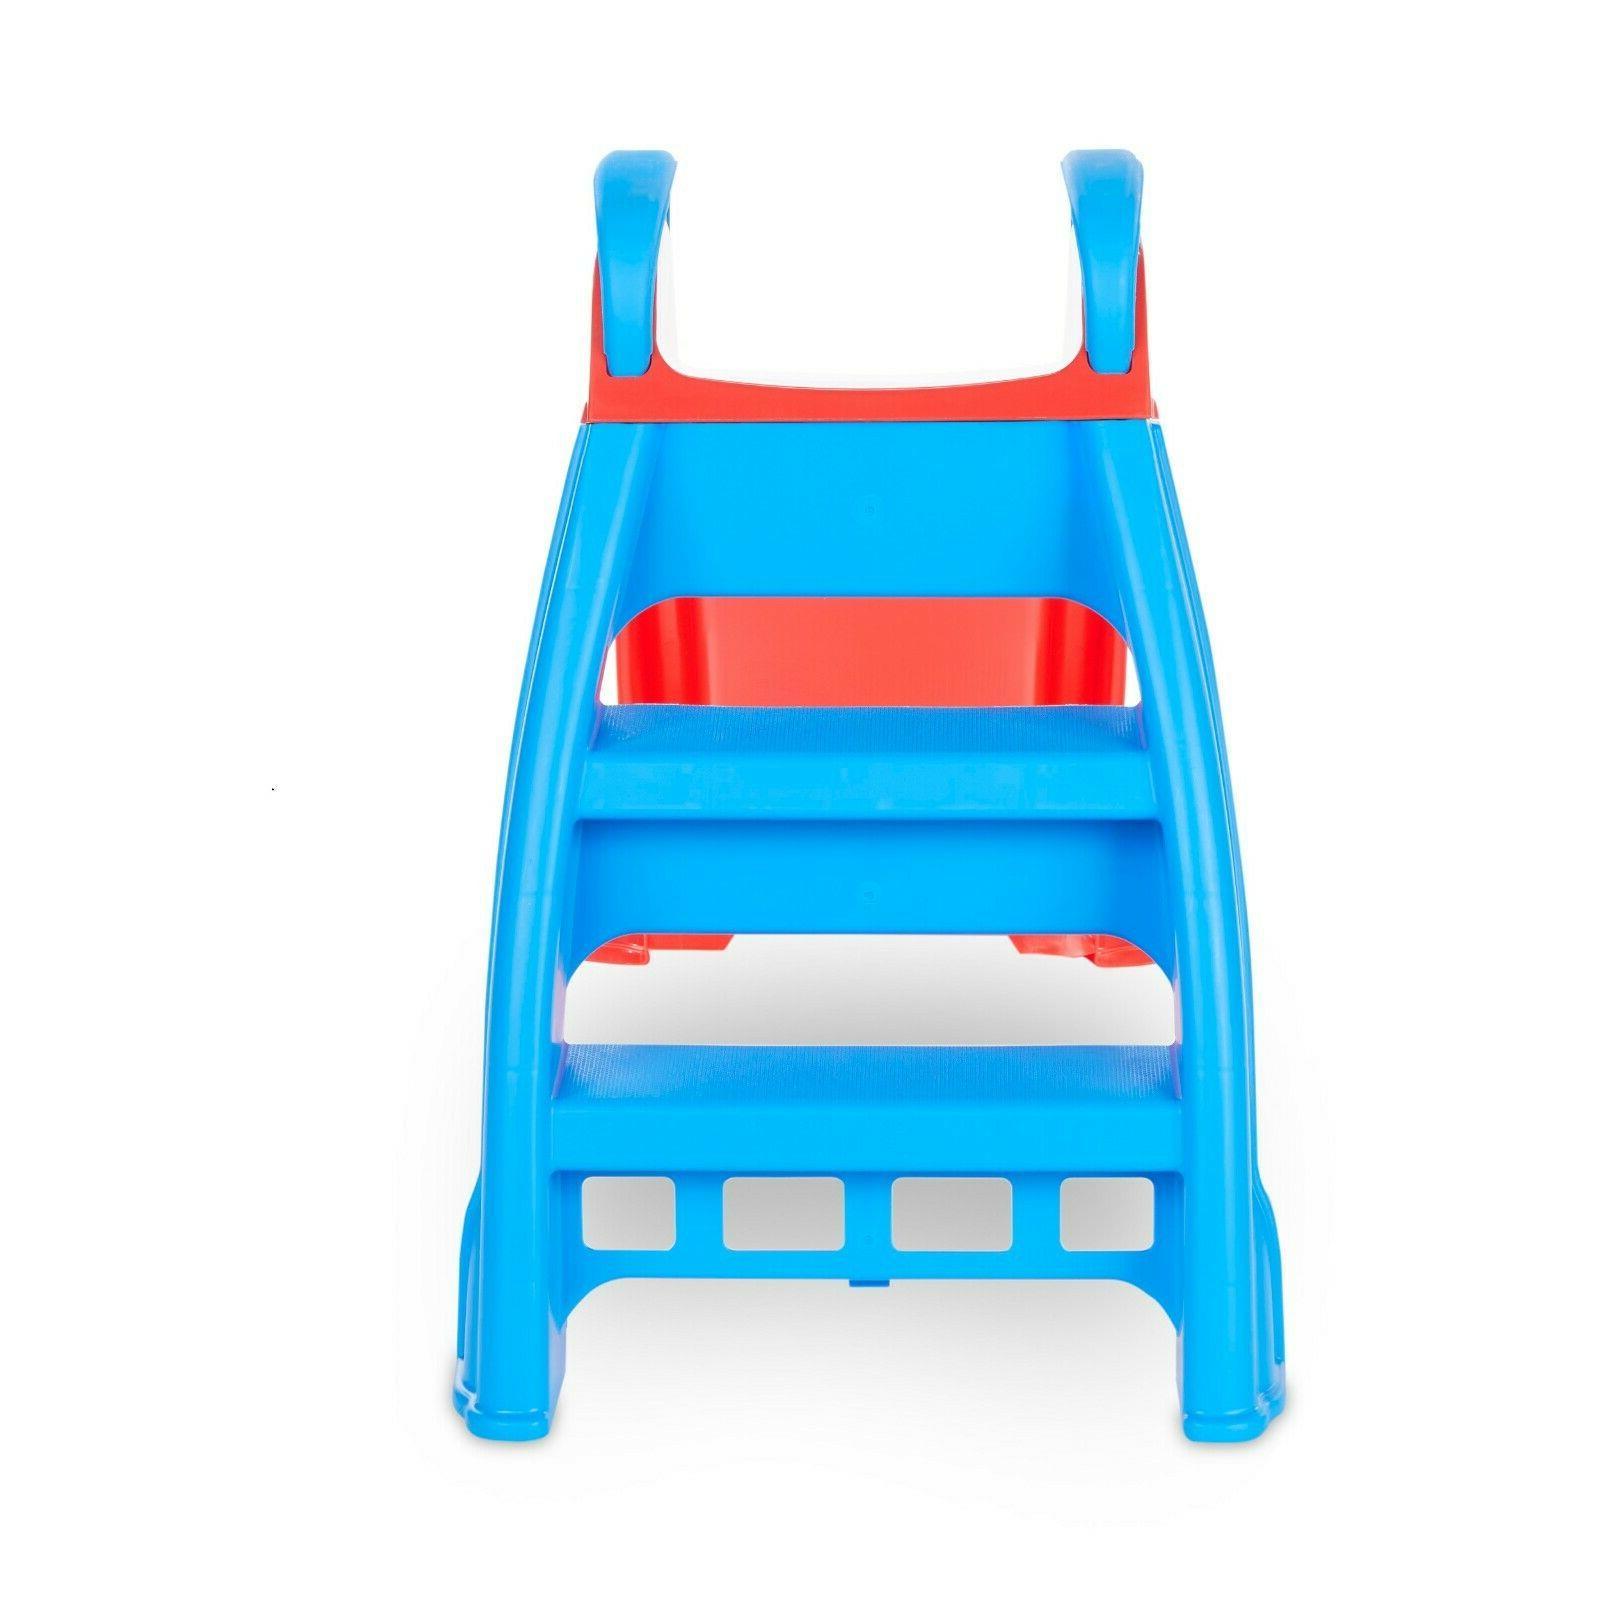 Children Foldable Activity Little Indoor Playset For Kids